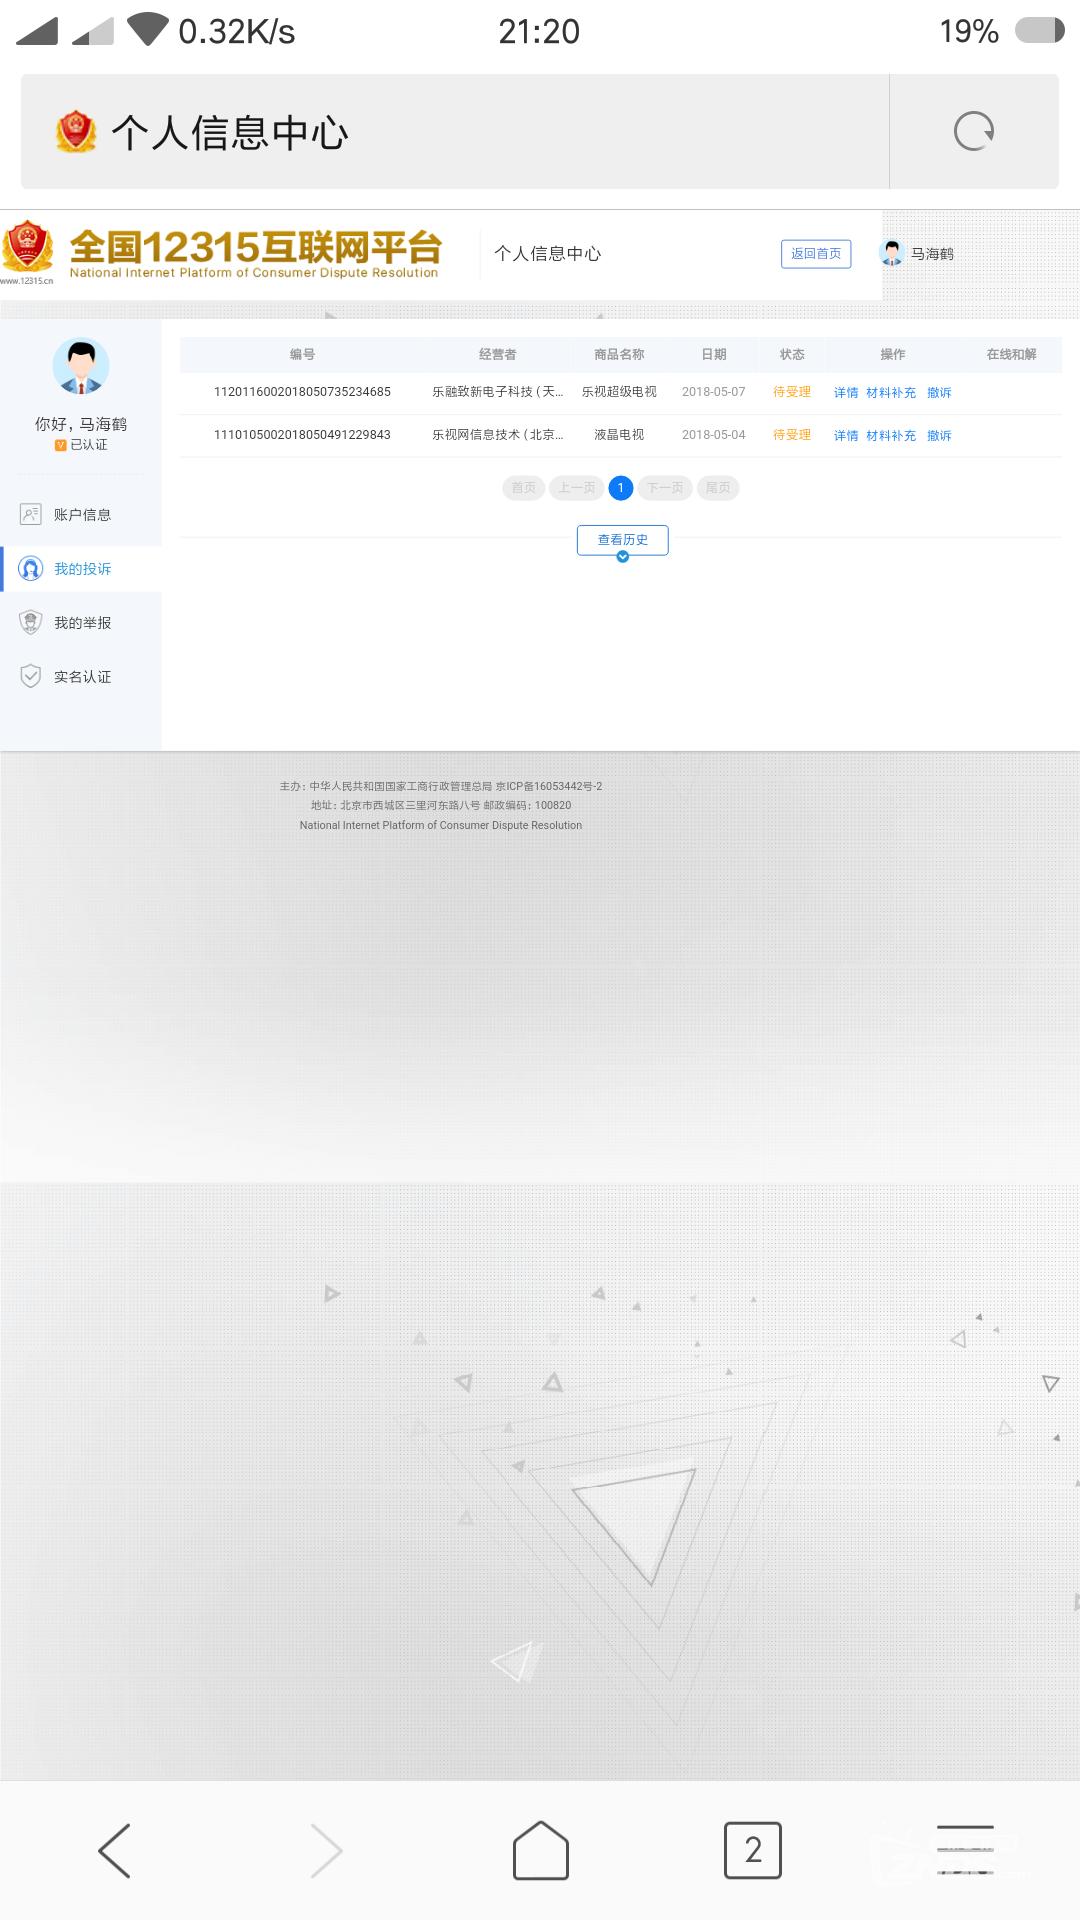 Screenshot_2018-05-07-21-20-25-648_com.android.browser.png